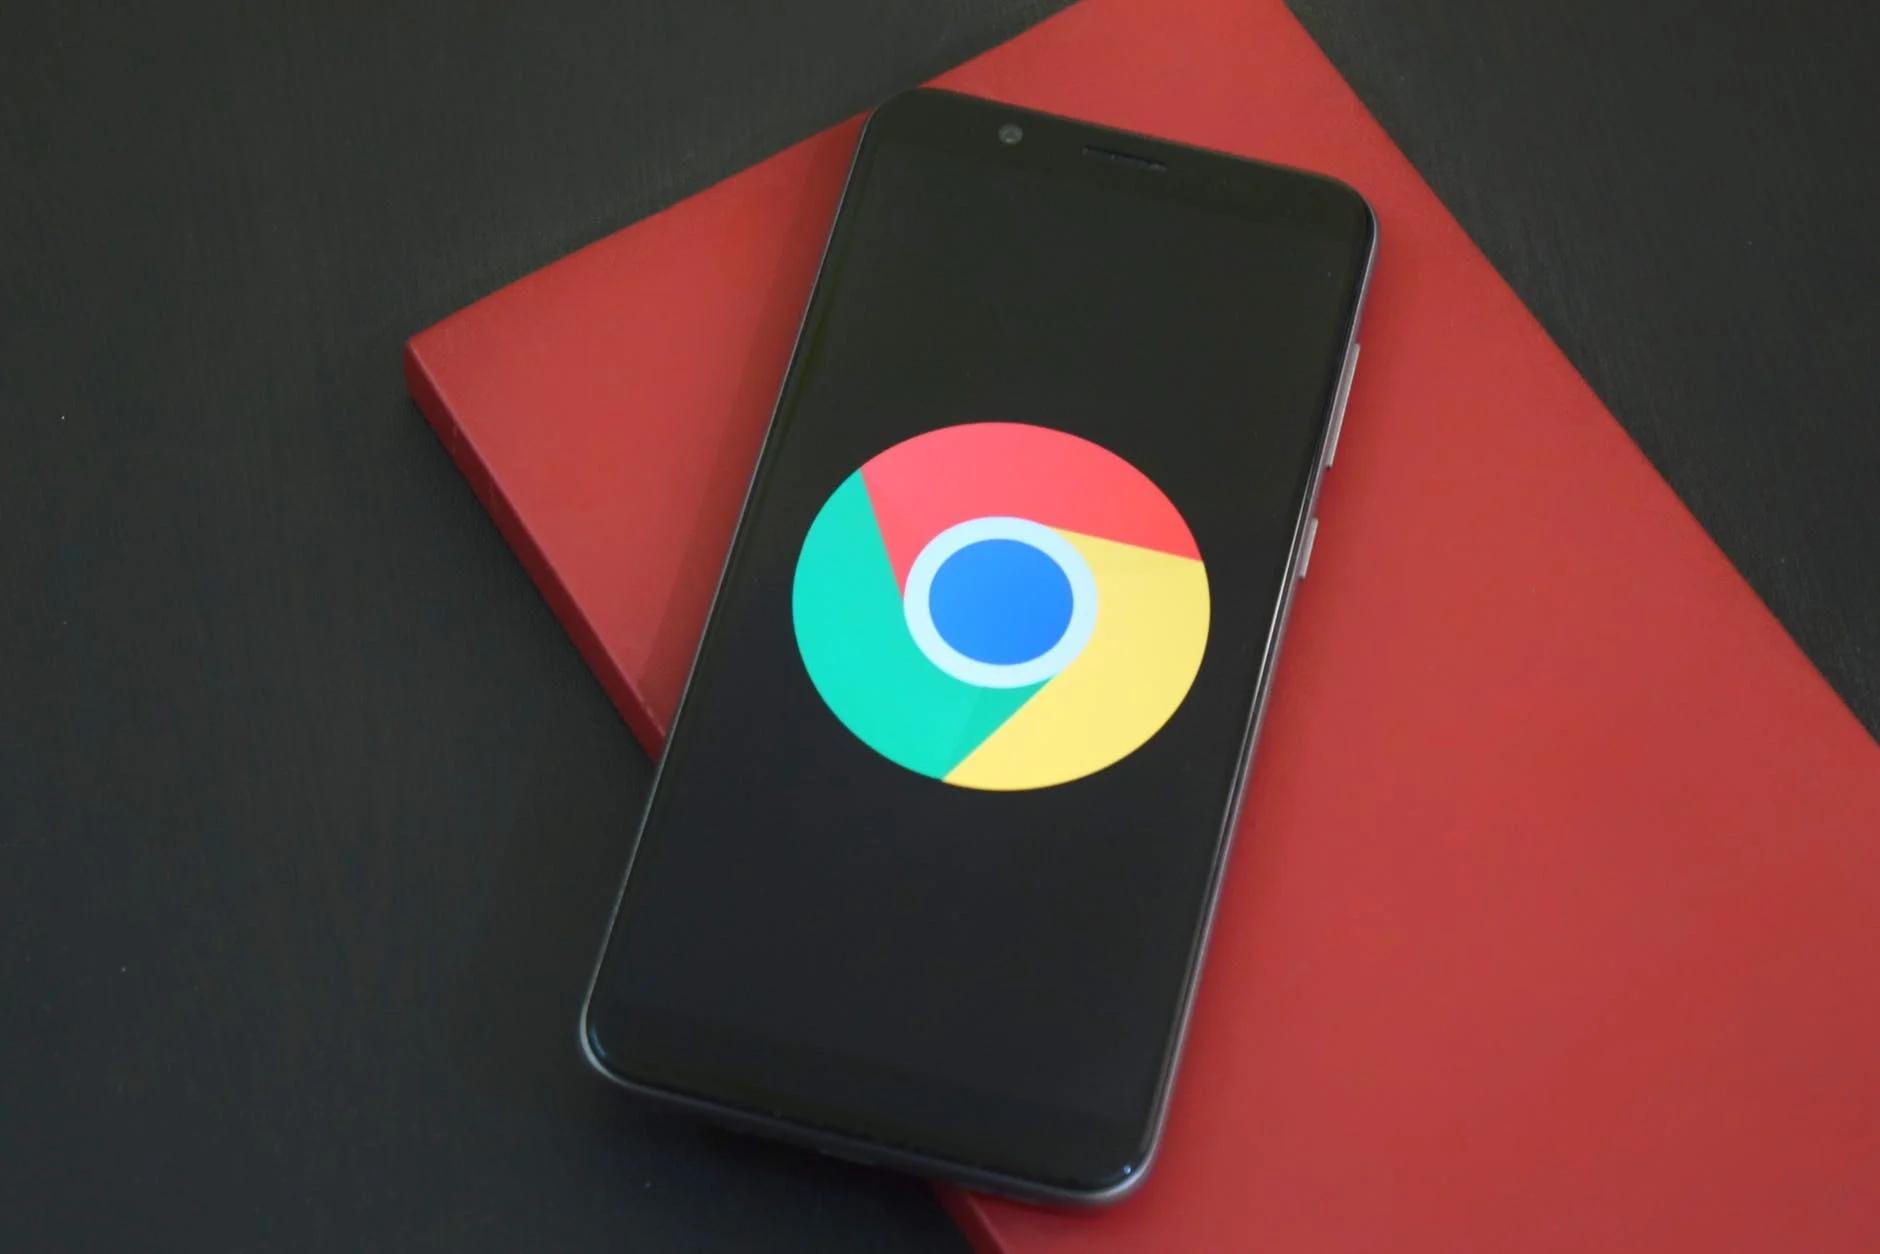 kelebihan android dibanding iphone